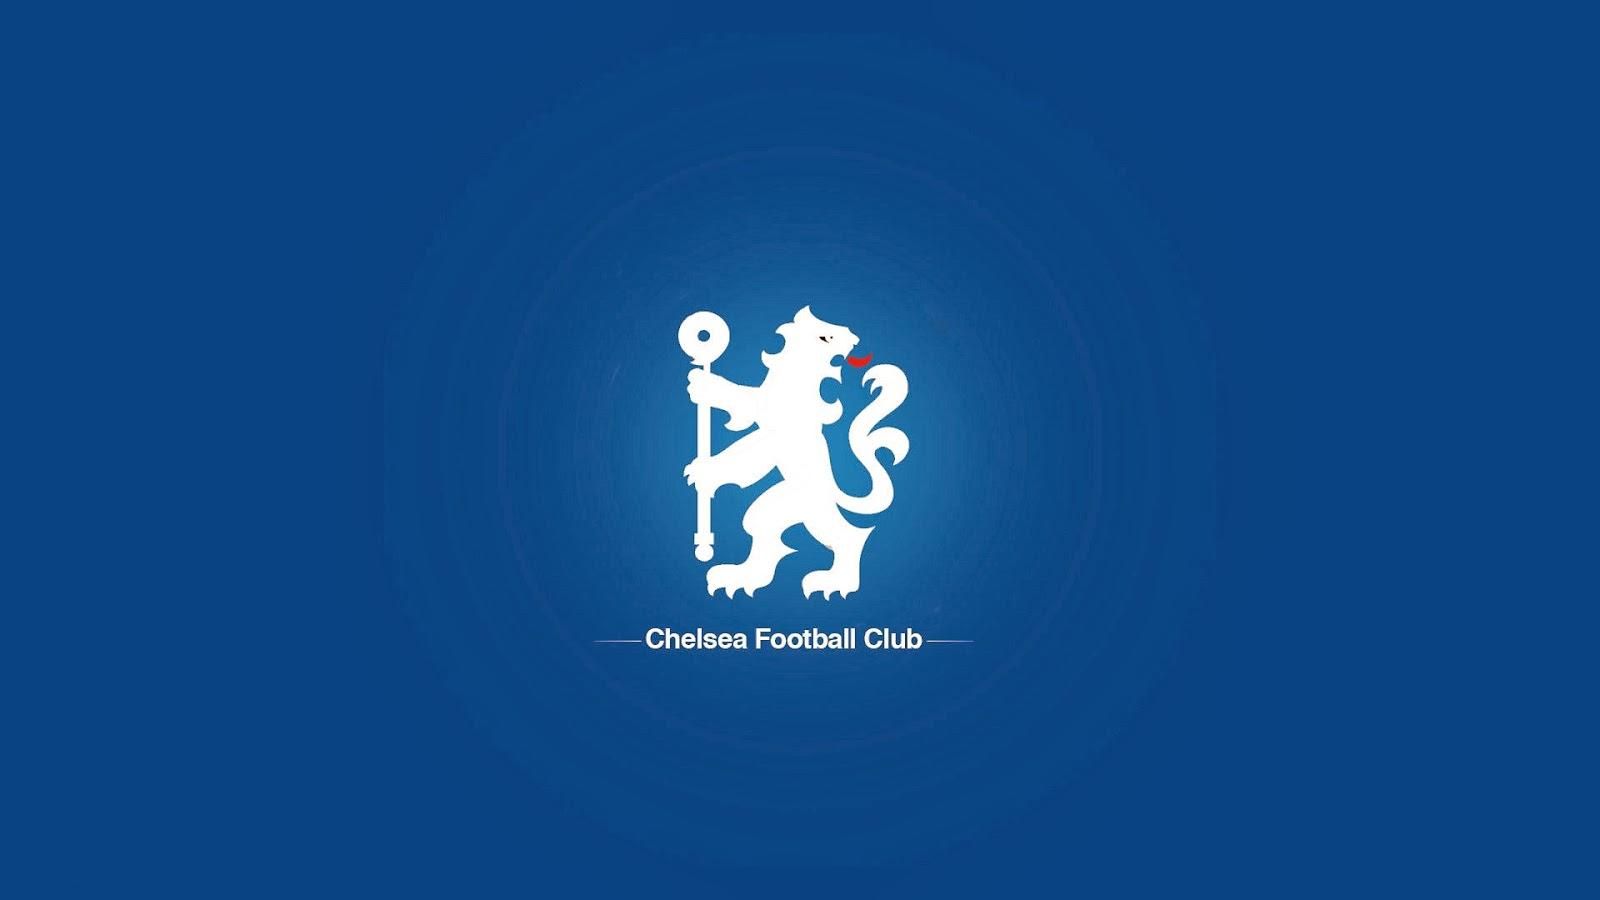 Chelsea Football Club HD Wallpapers